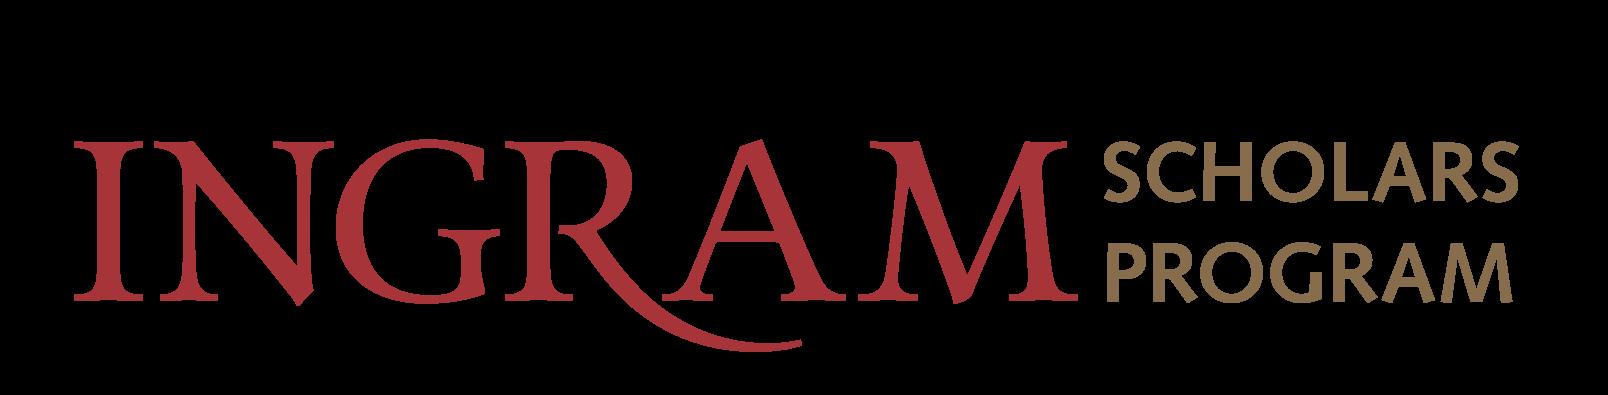 logo Ingram Scholar Program